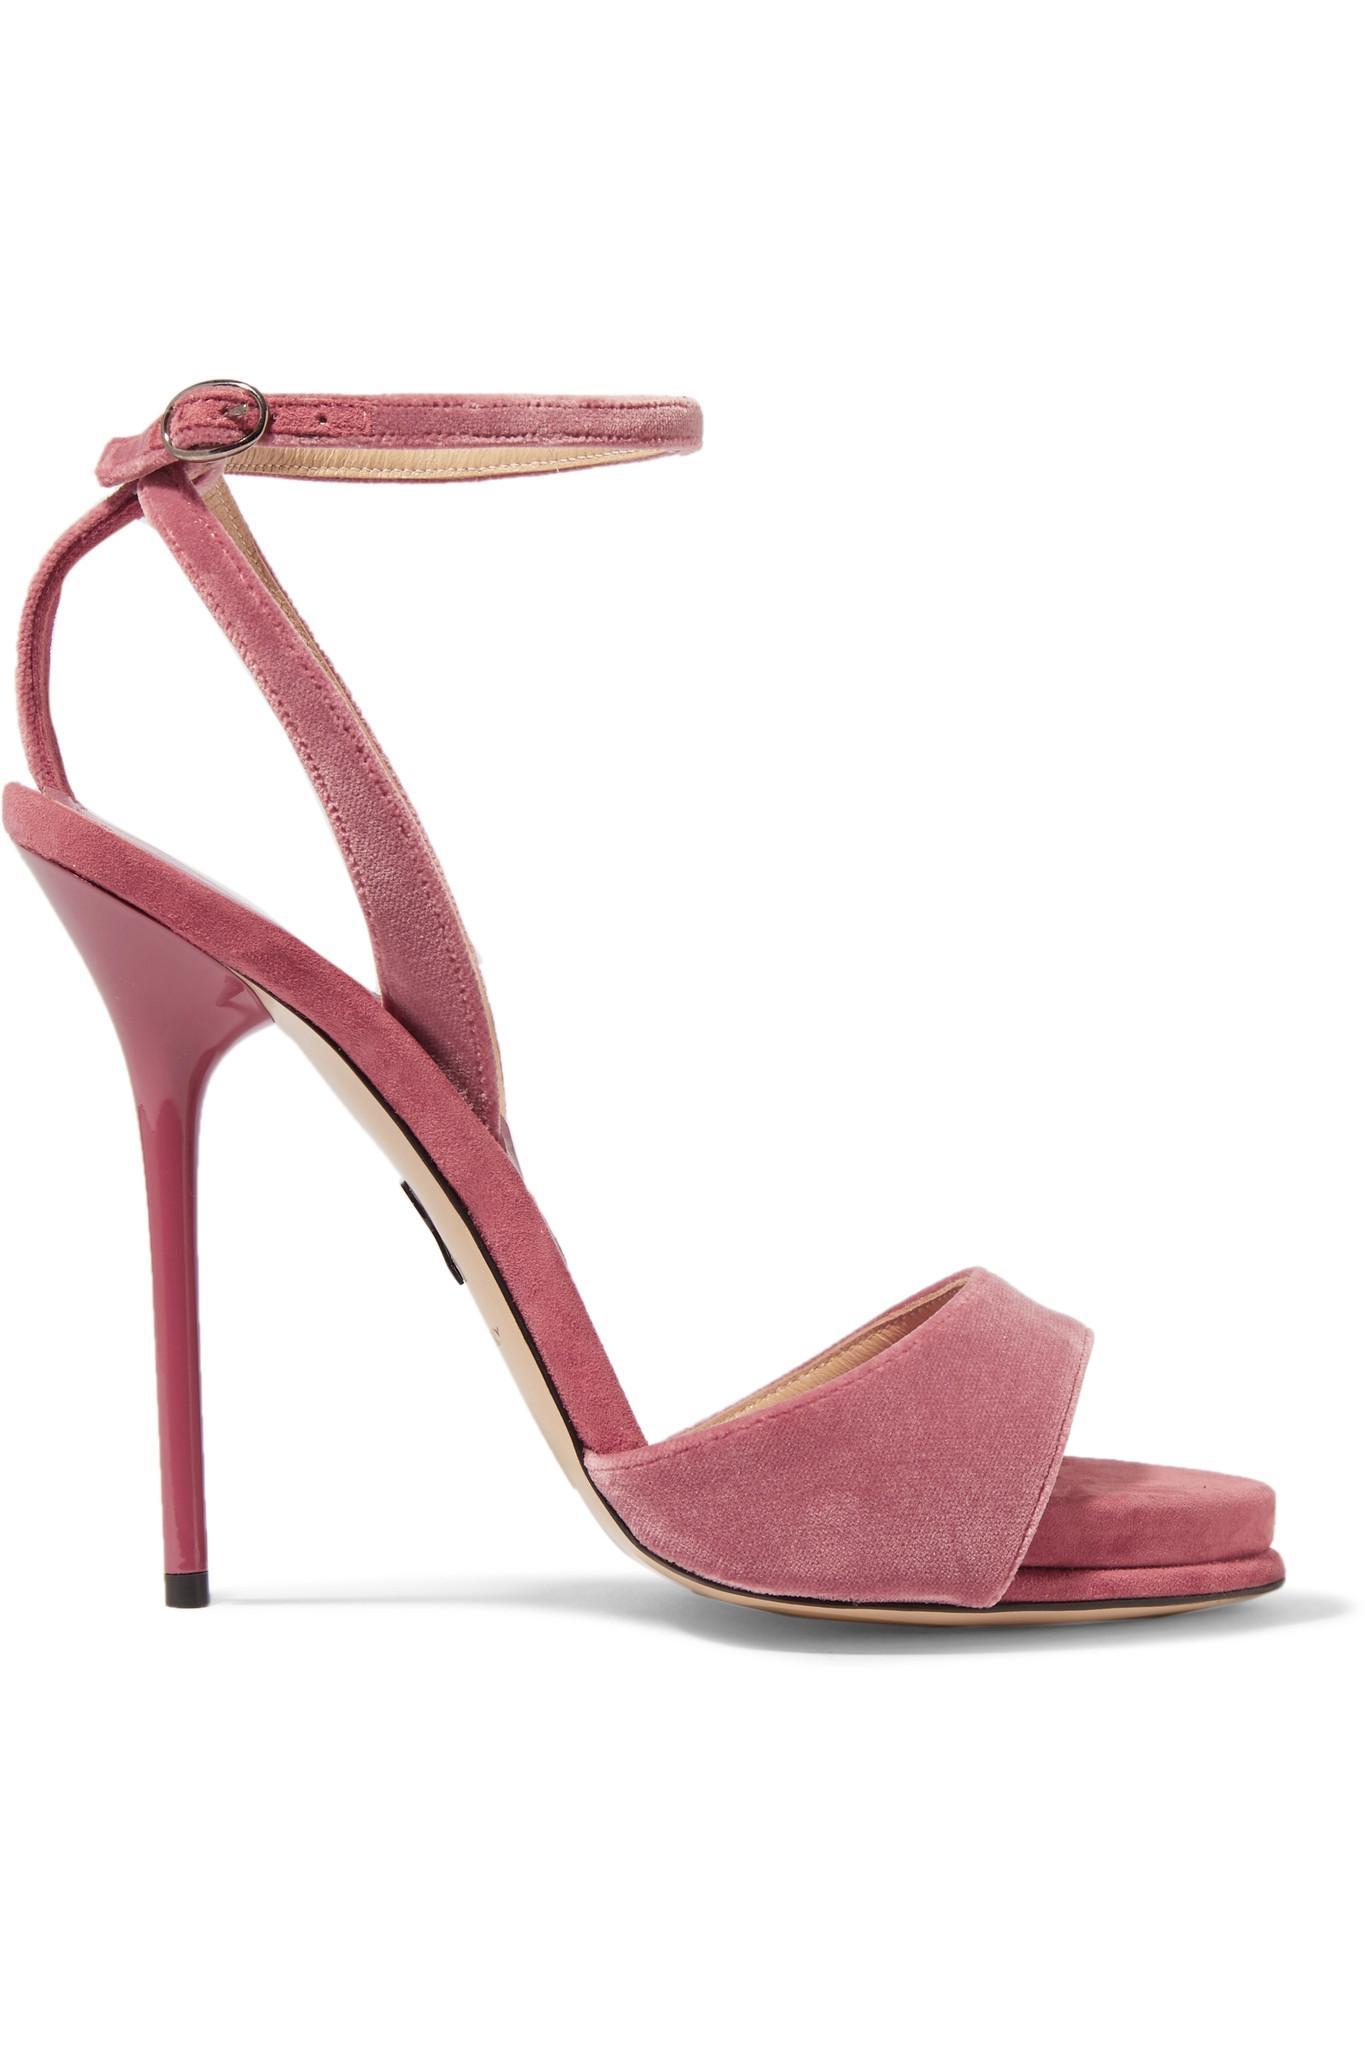 Paul Andrew Velvet Cutout Sandals discount big discount bK7I0iOgk